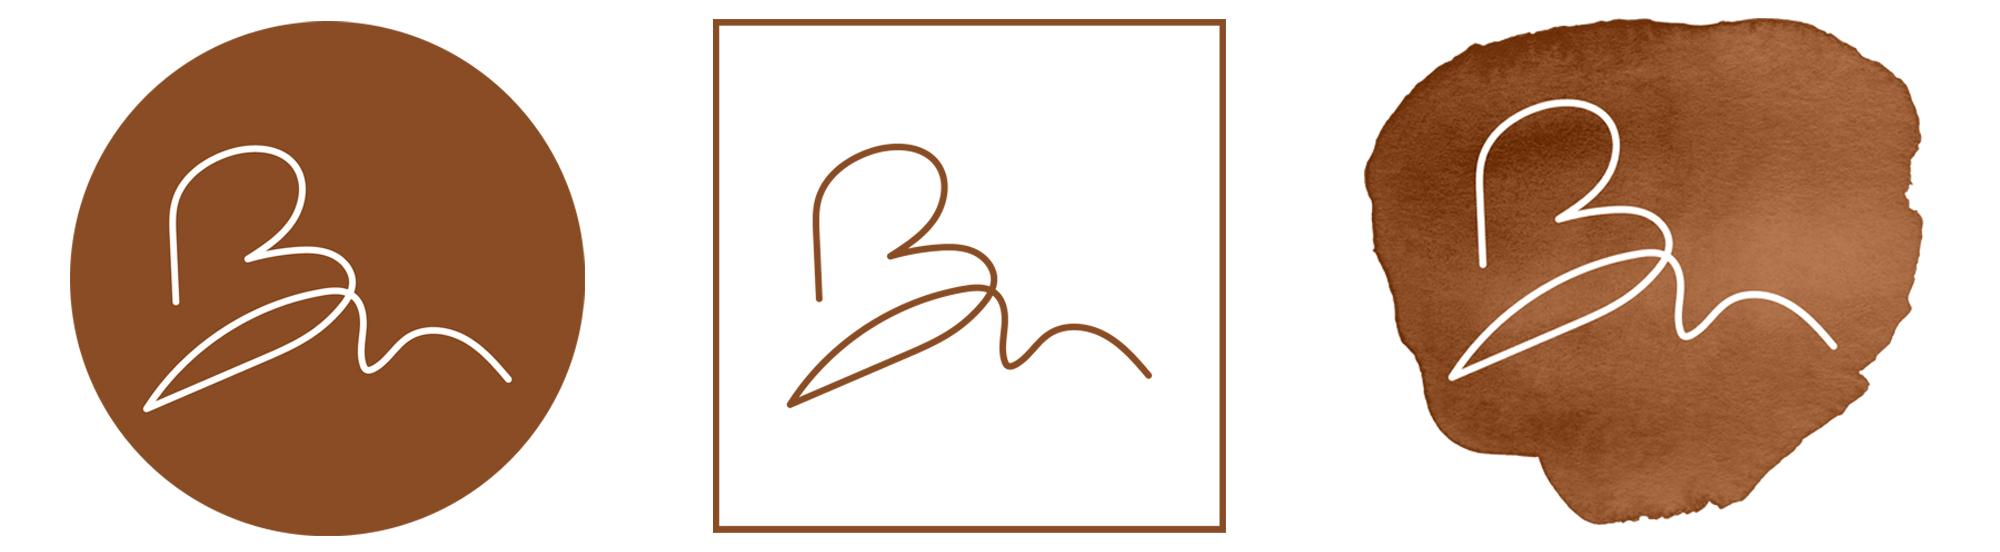 Branding Beauty like Maya 05 - studio katipeifer